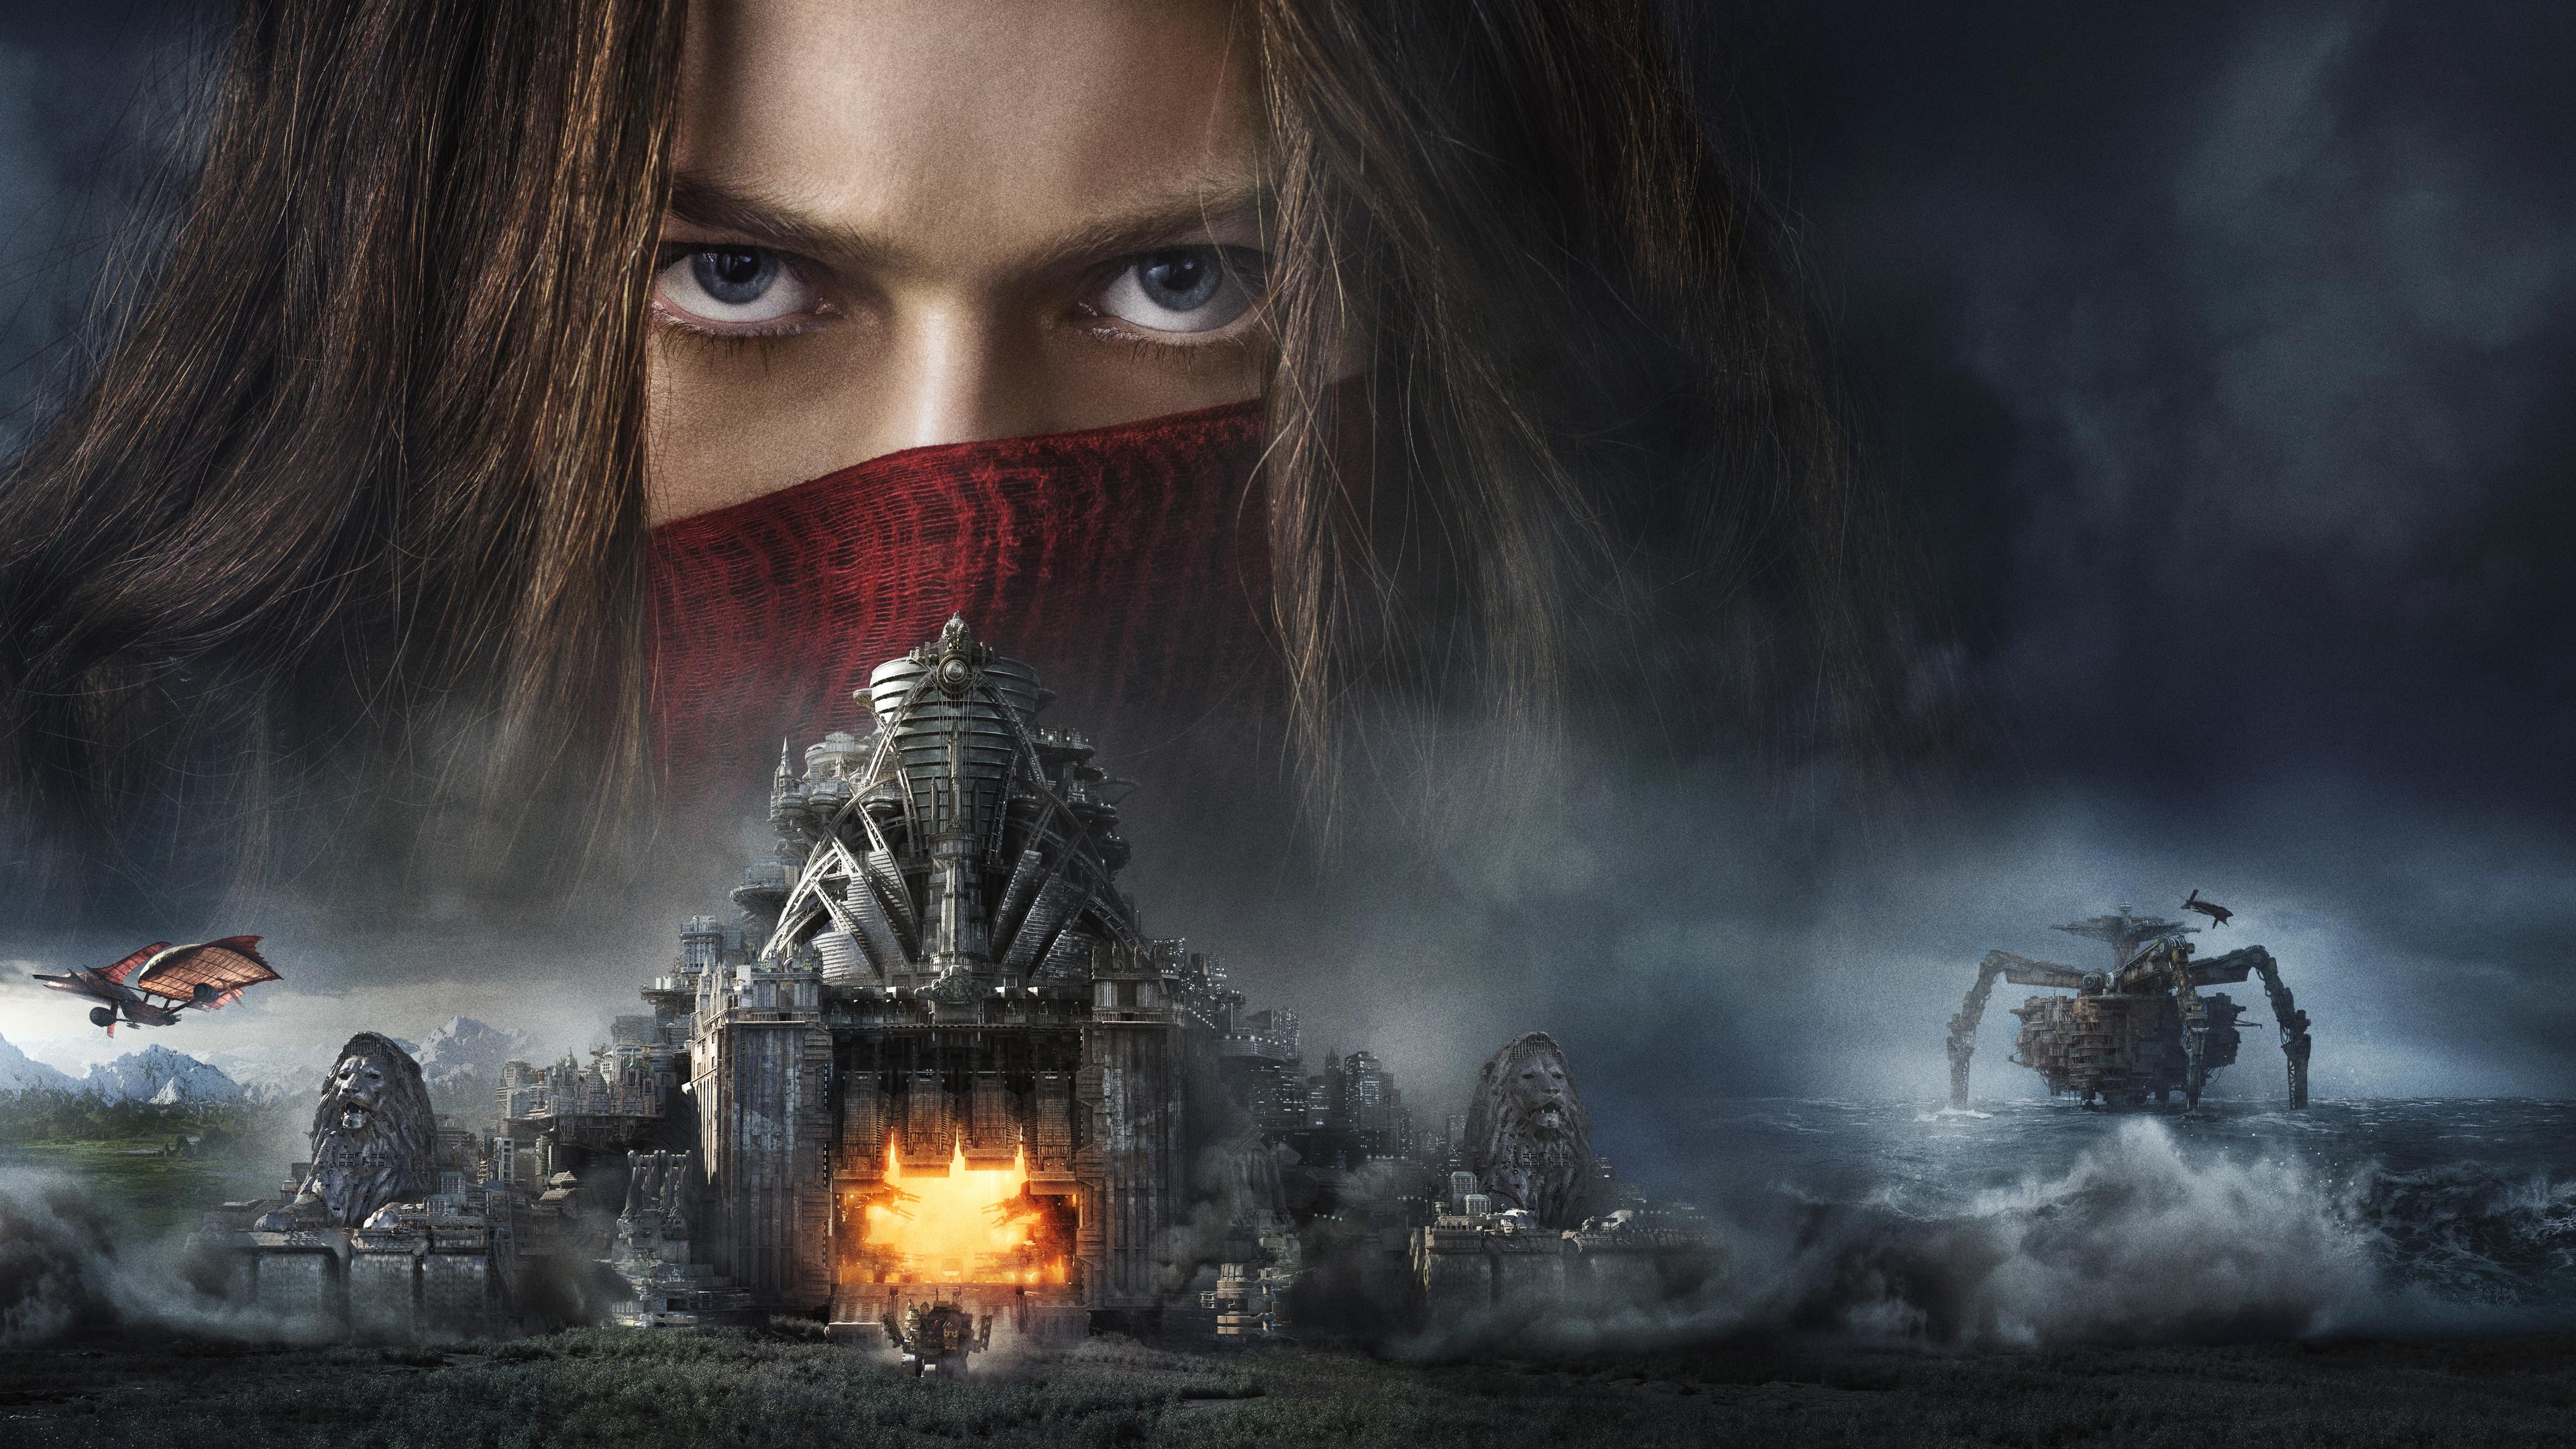 Wallpaper 4k Mortal Engines Movie 4k 2018 Movies Wallpapers